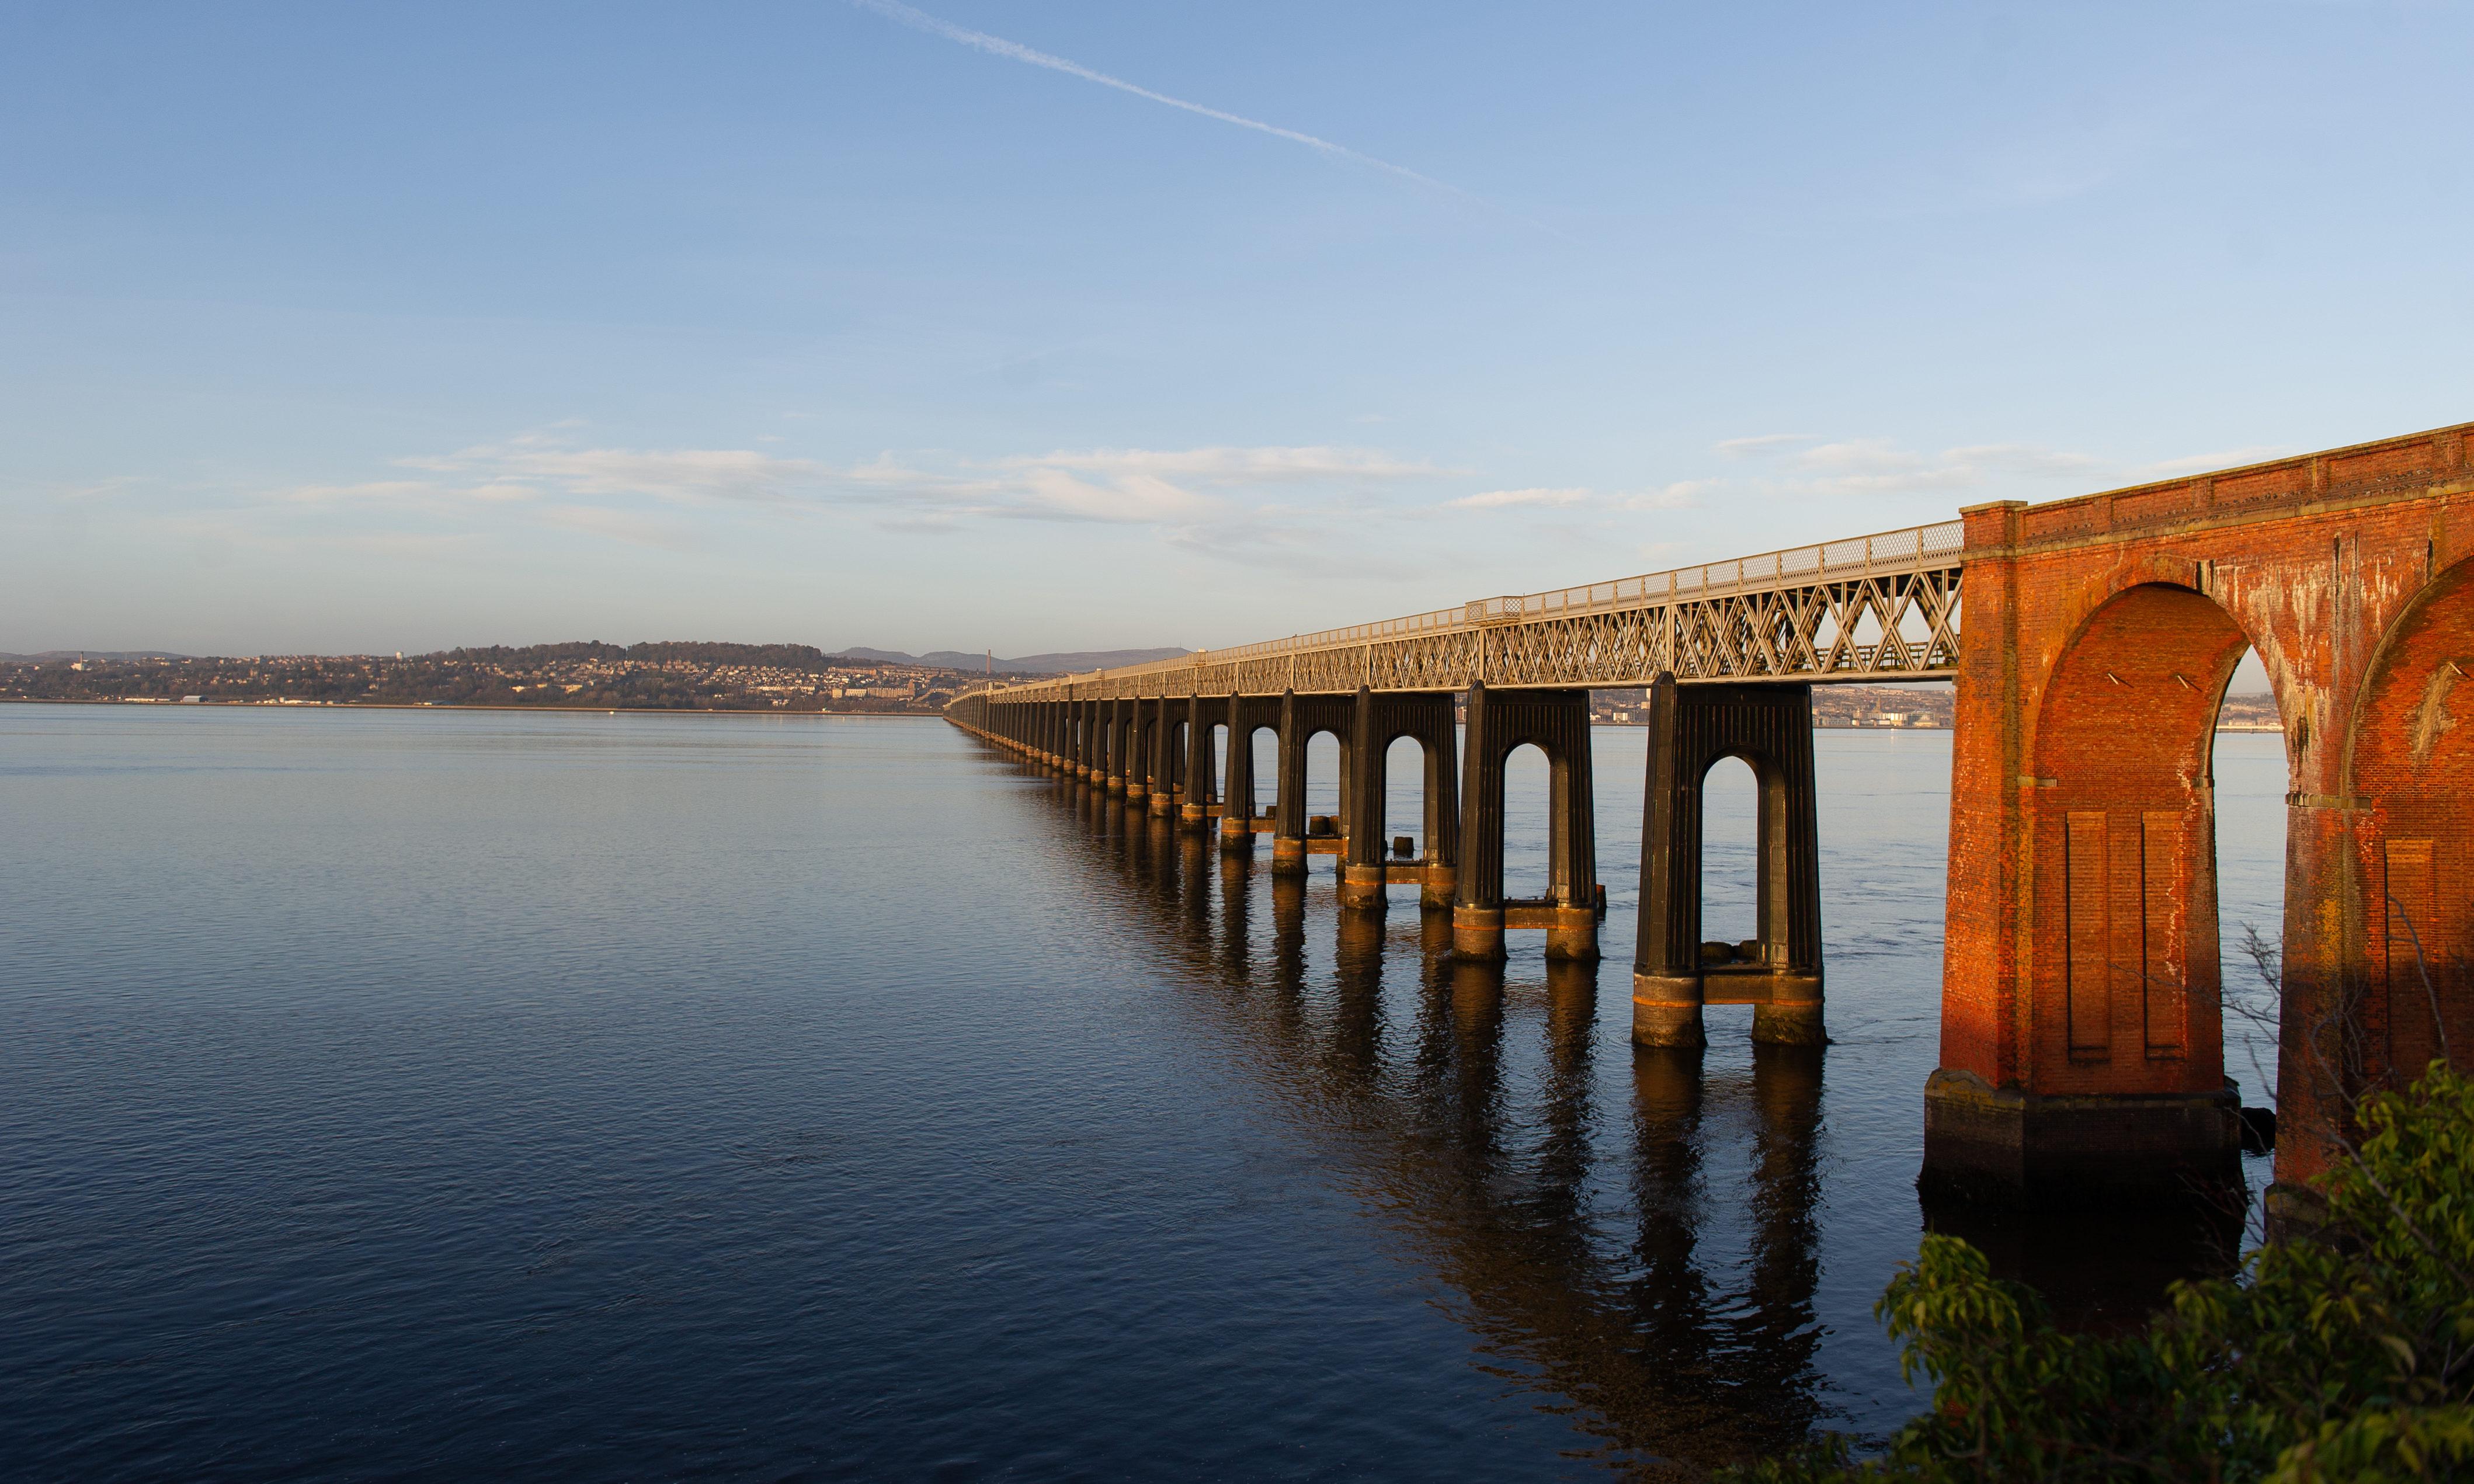 The Tay Rail Bridge.